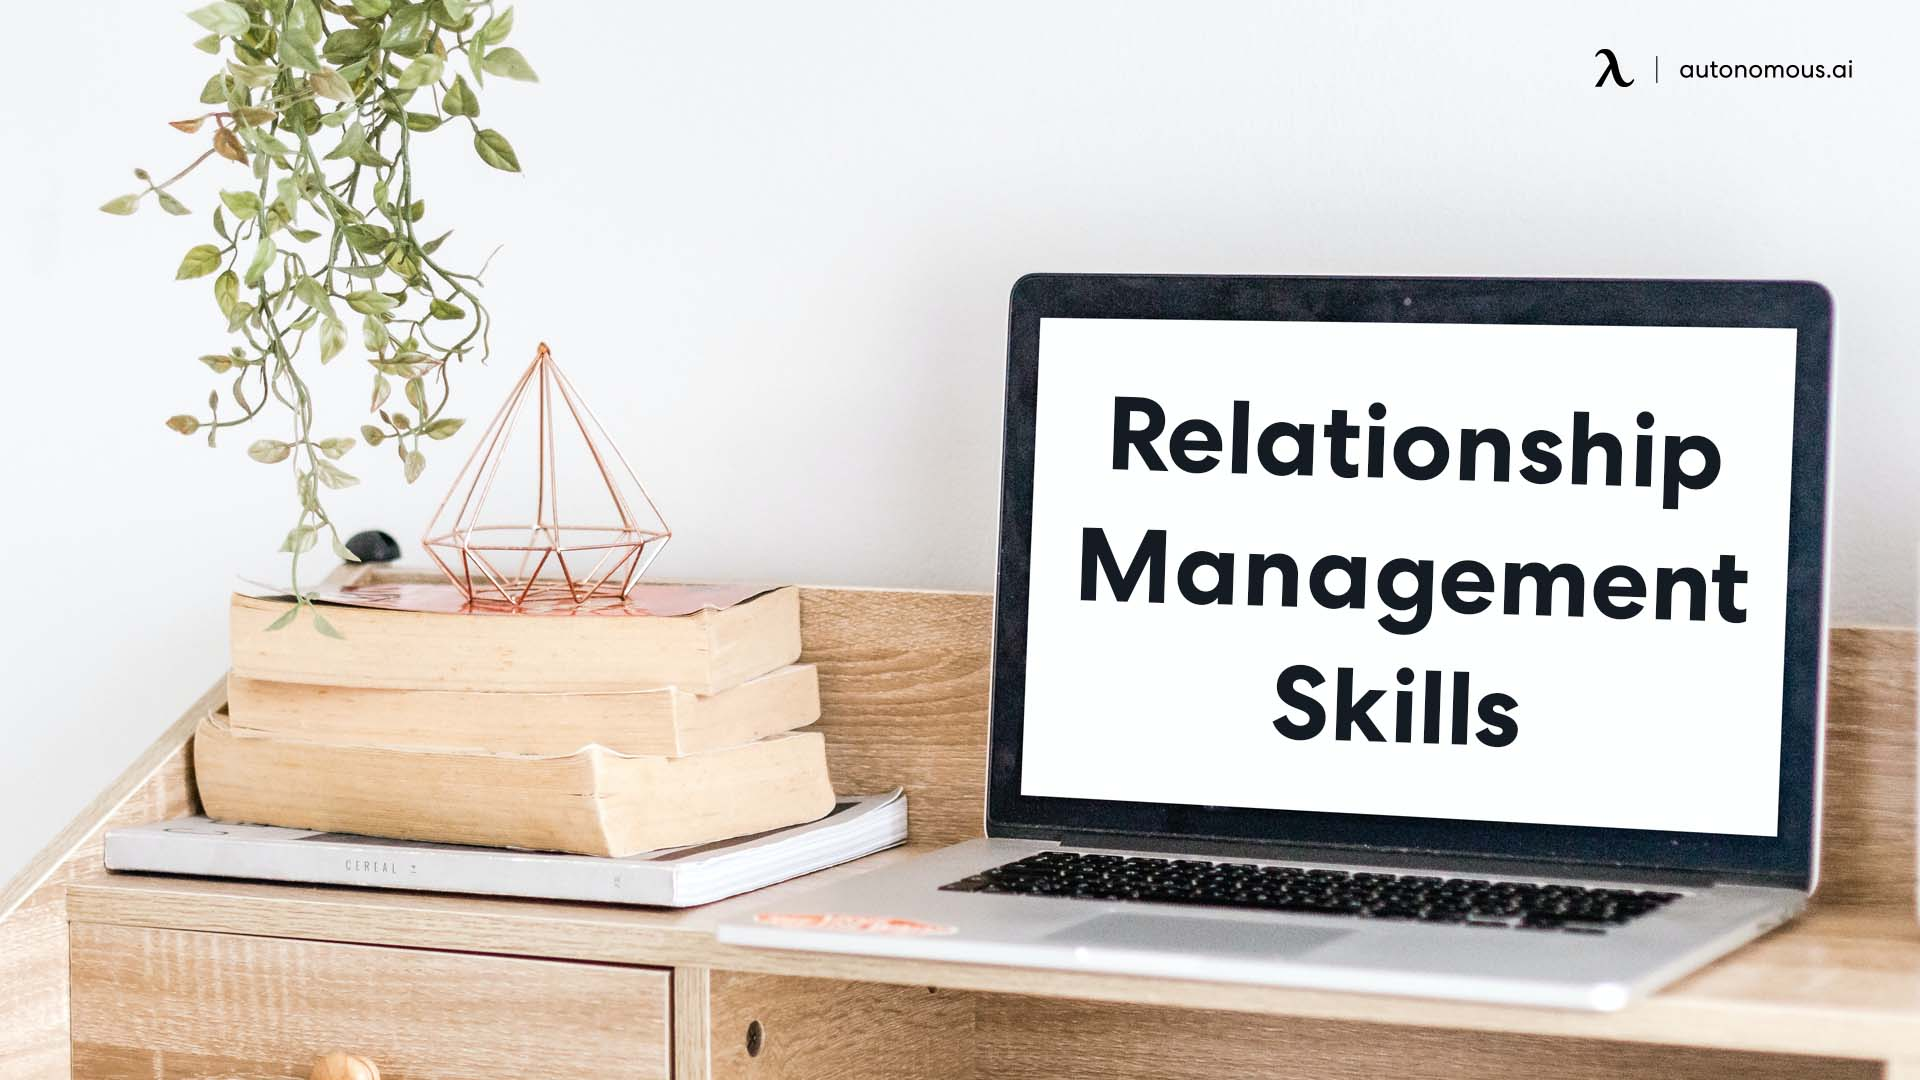 Relationship Management Skills.jpg